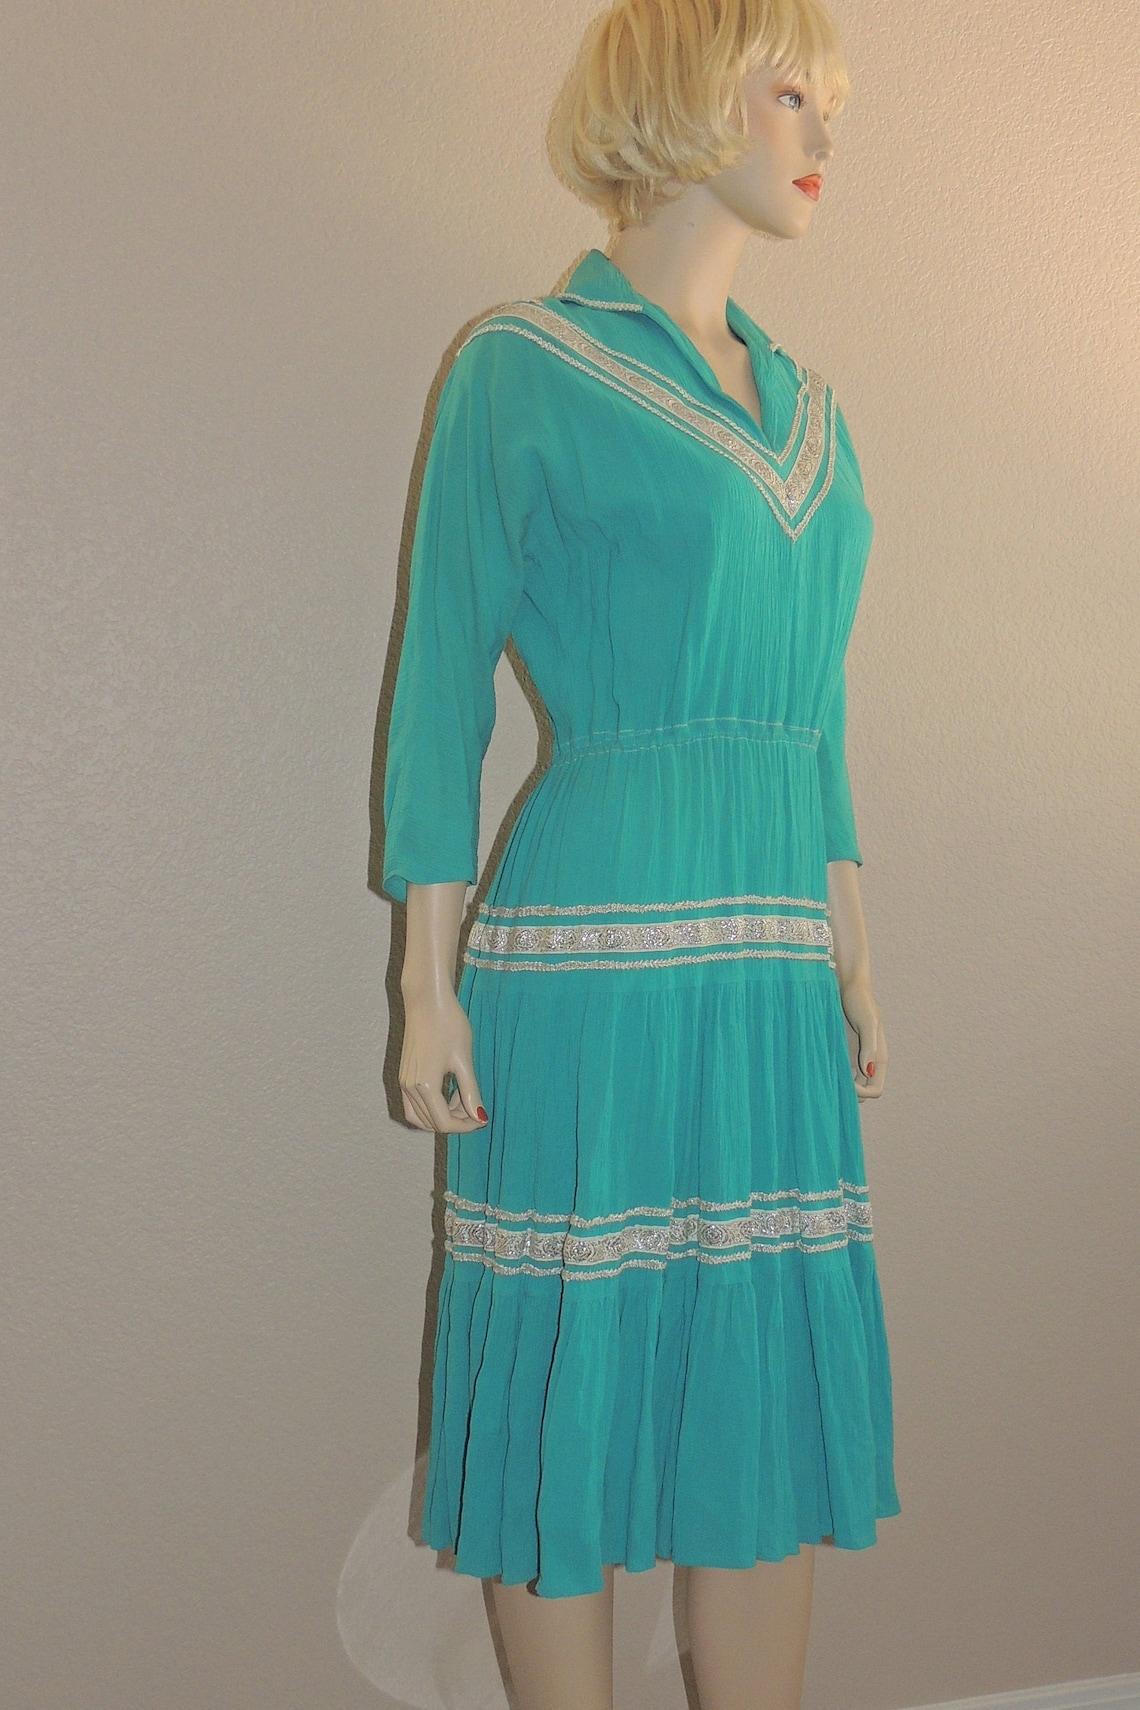 1950s Aqua PATIO Dress with Silvertone Rickrack